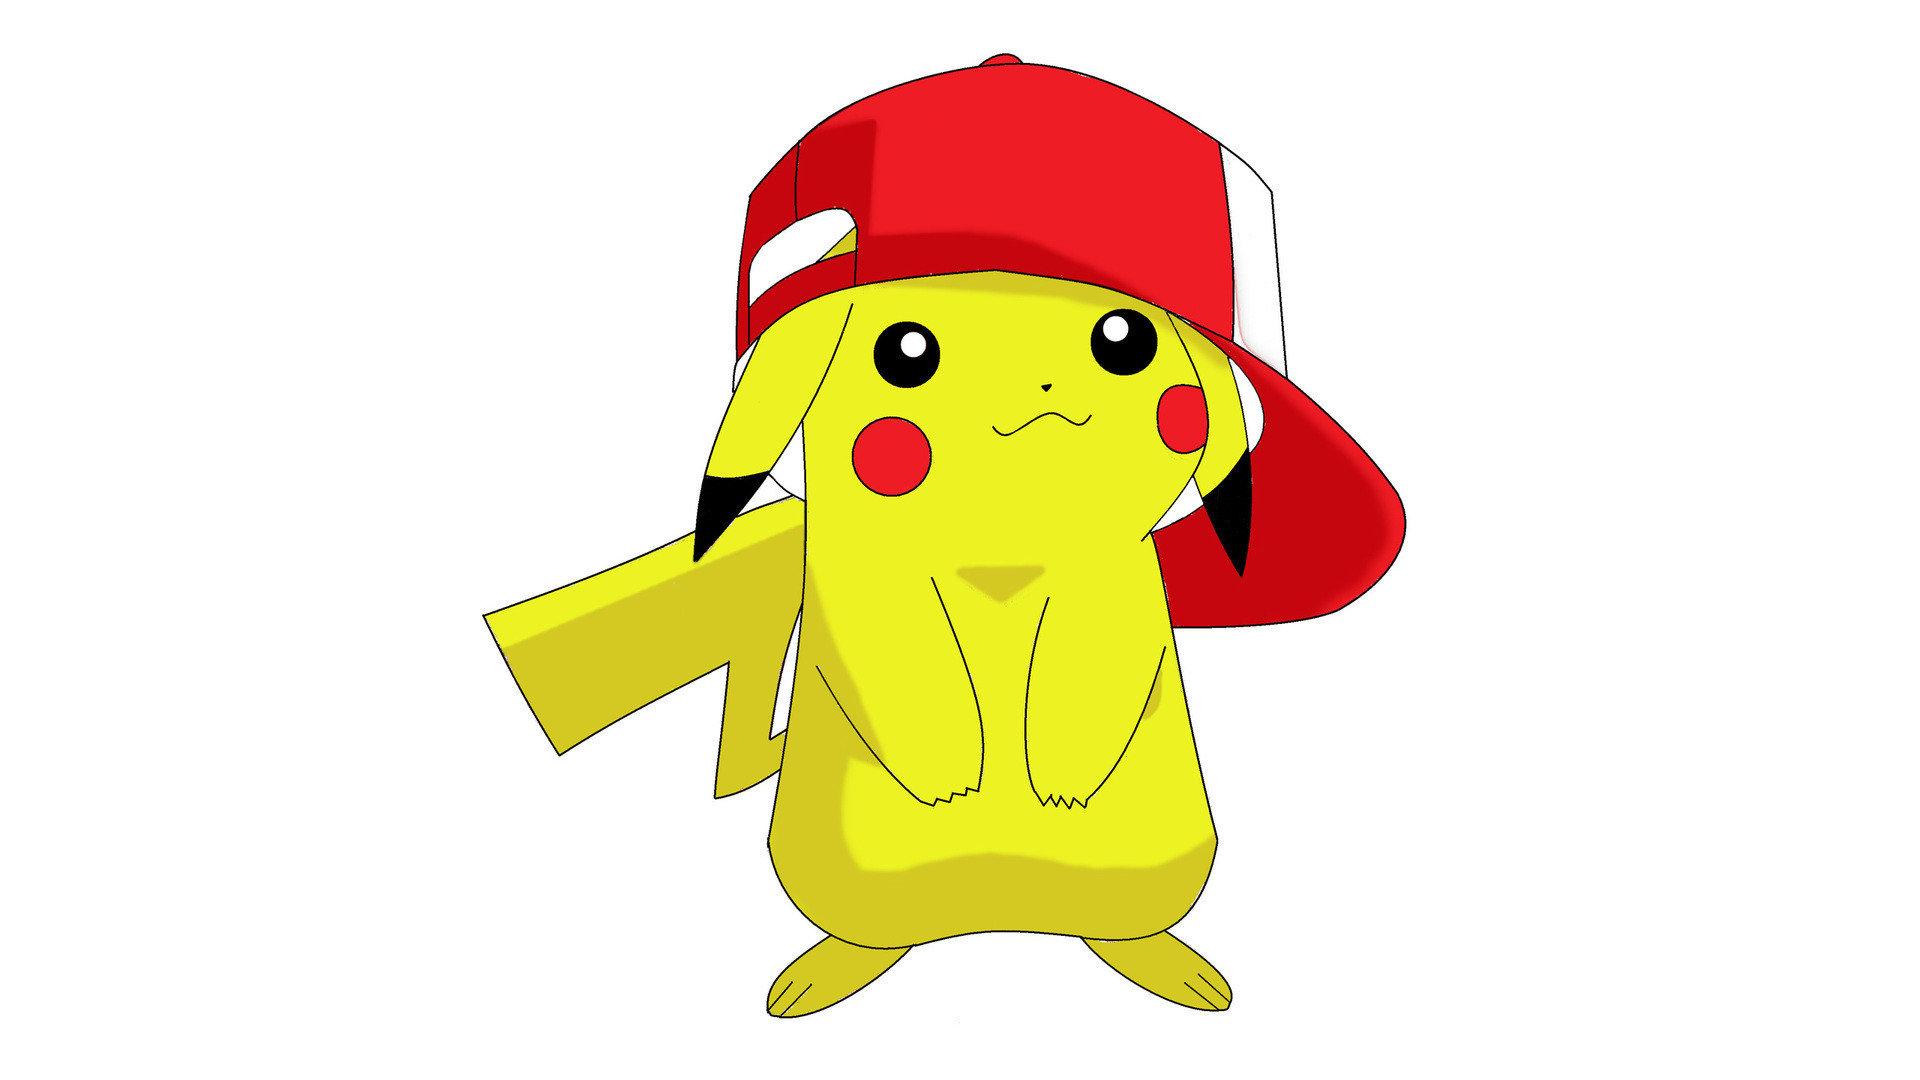 Pikachu wallpapers 1920x1080 Full HD (1080p) desktop ...